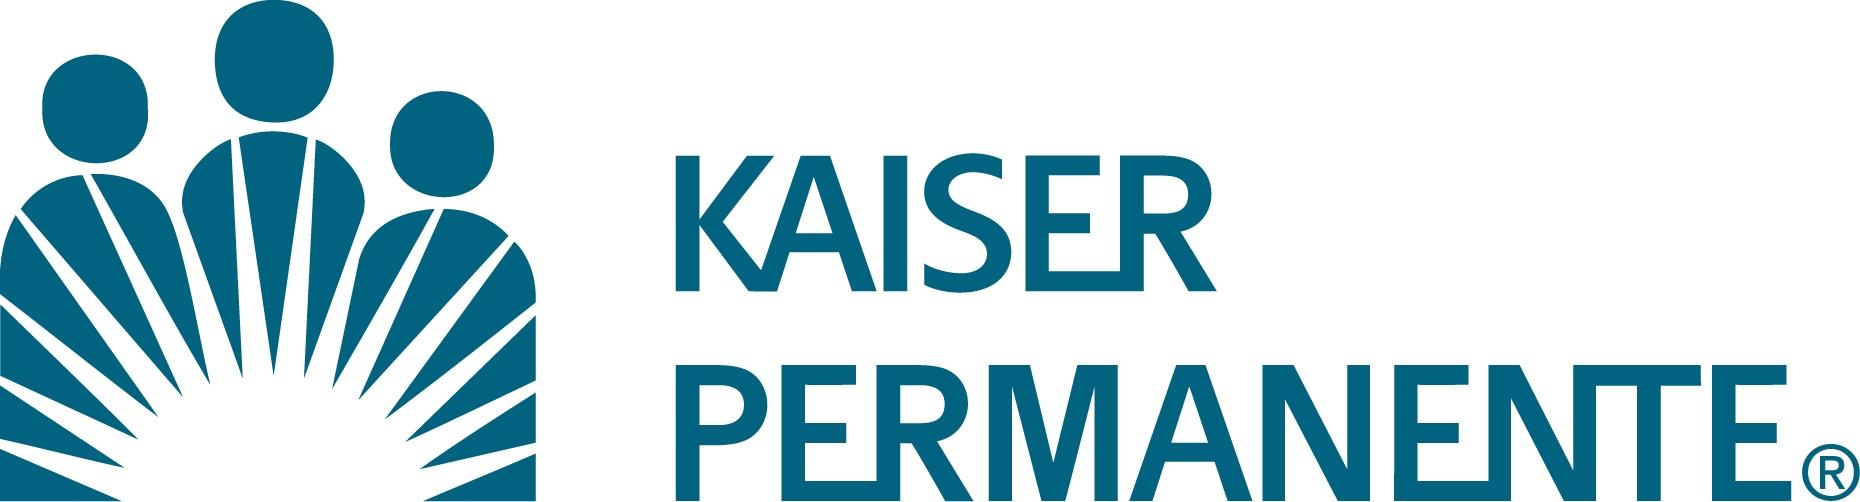 Kaiser Permanente (Santa Clara, CA)